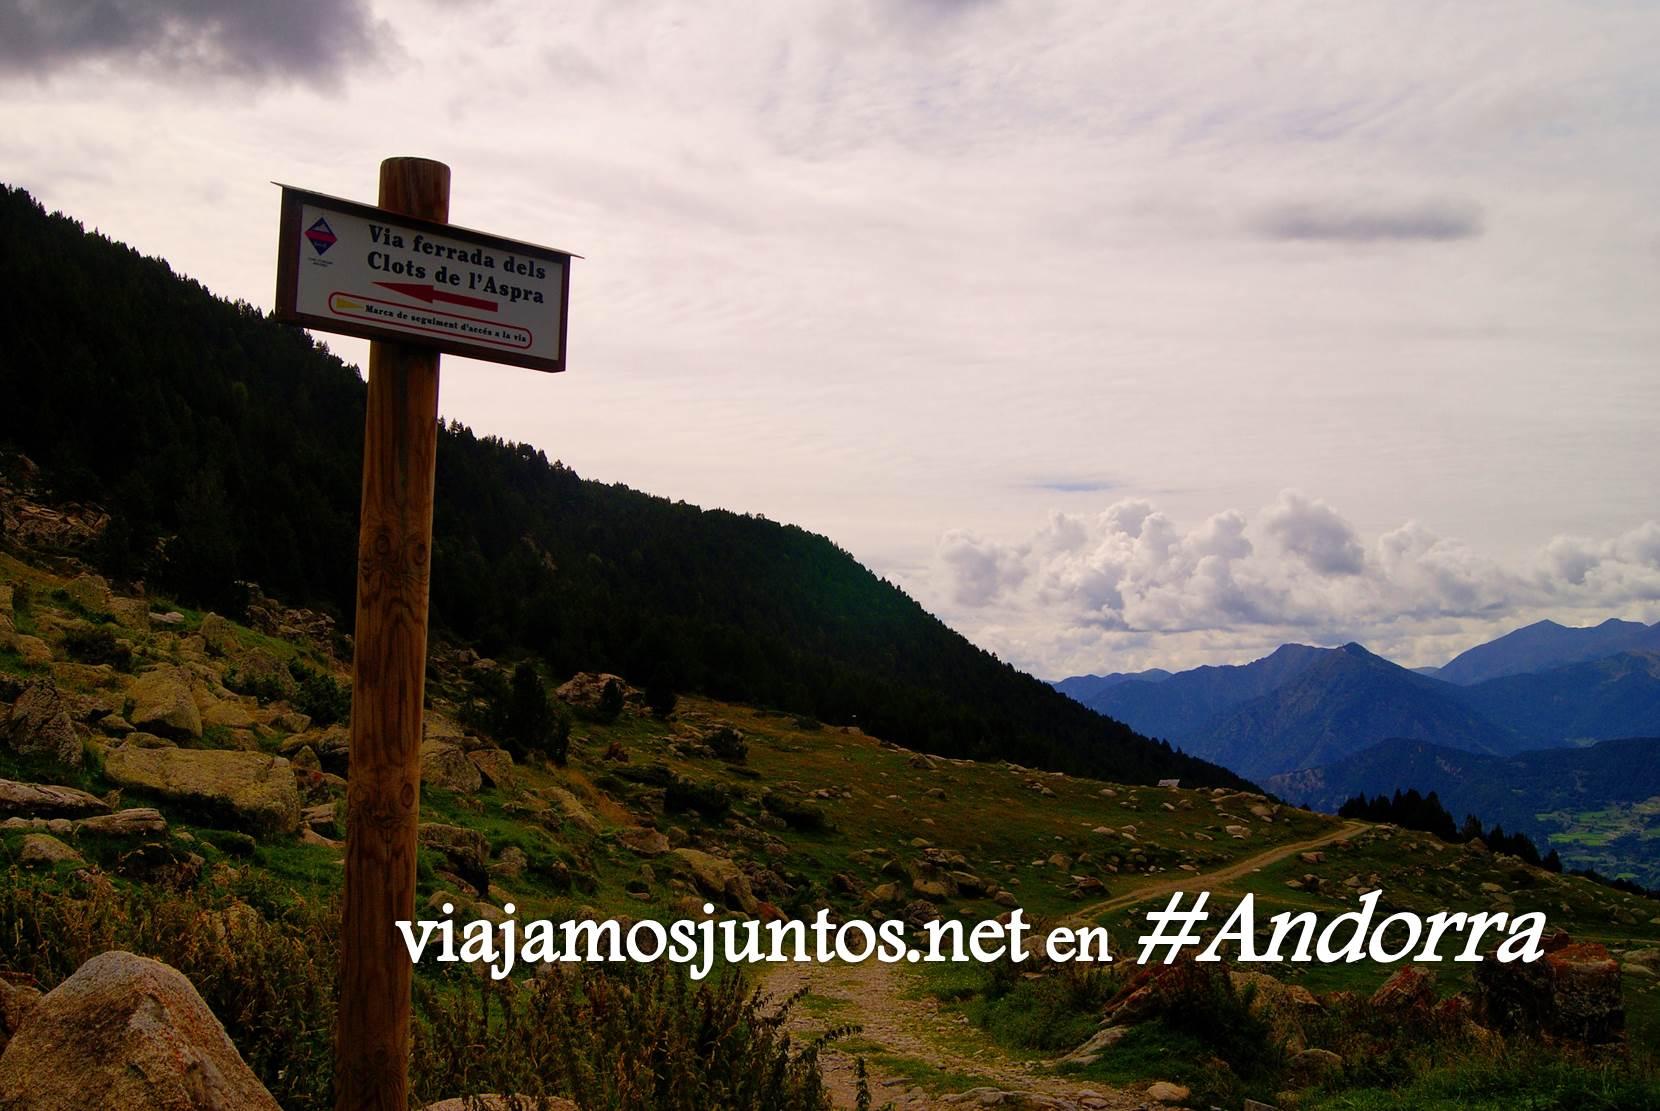 Direcciones para llegar a la vía ferrata Clots de l'Aspra; Encamp, Andorra